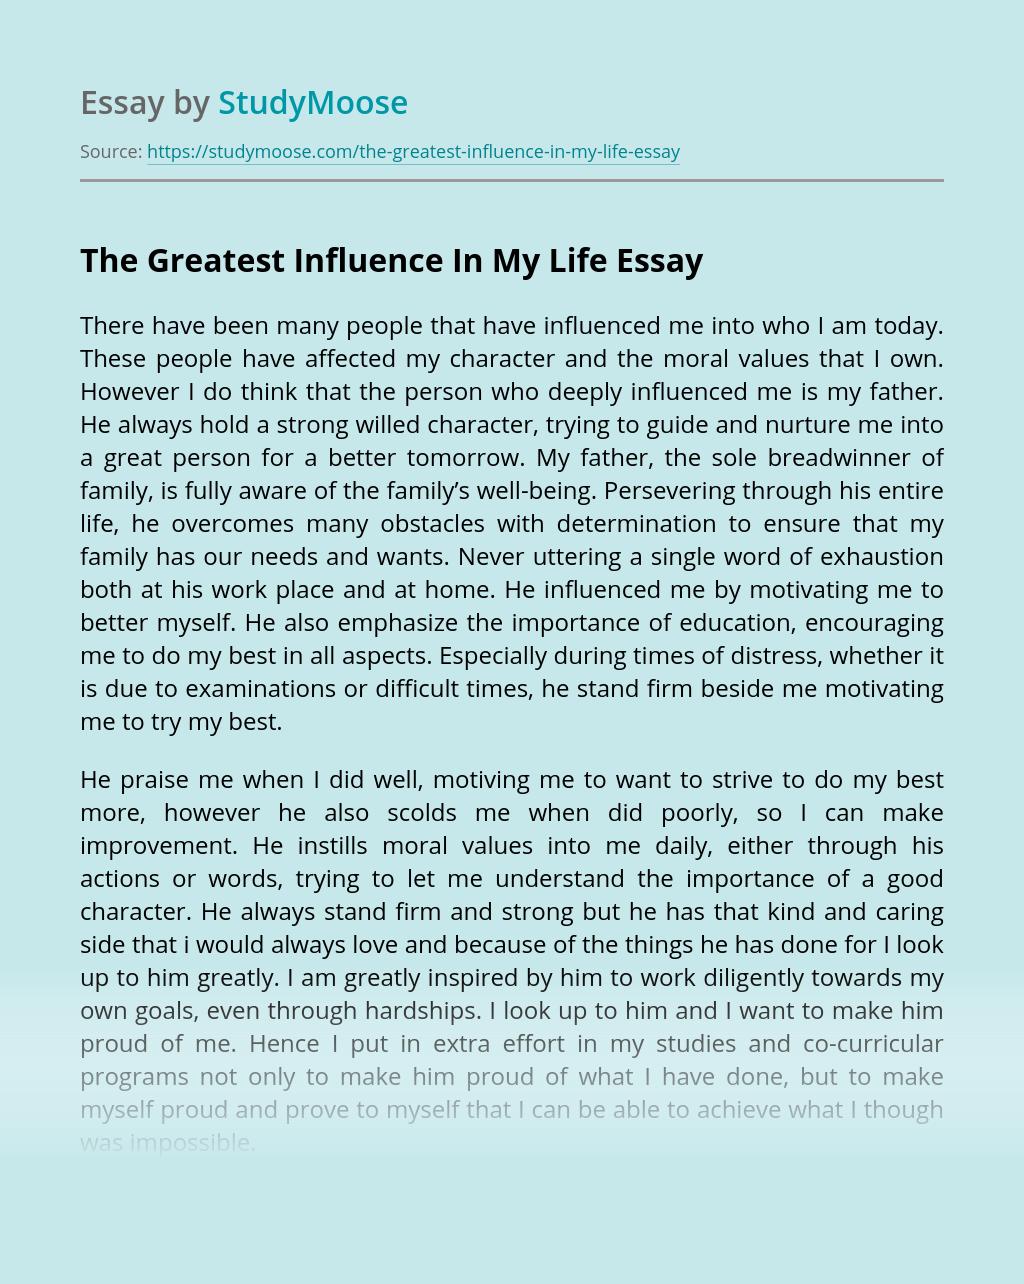 Influencing essay custom masters essay ghostwriter website for mba